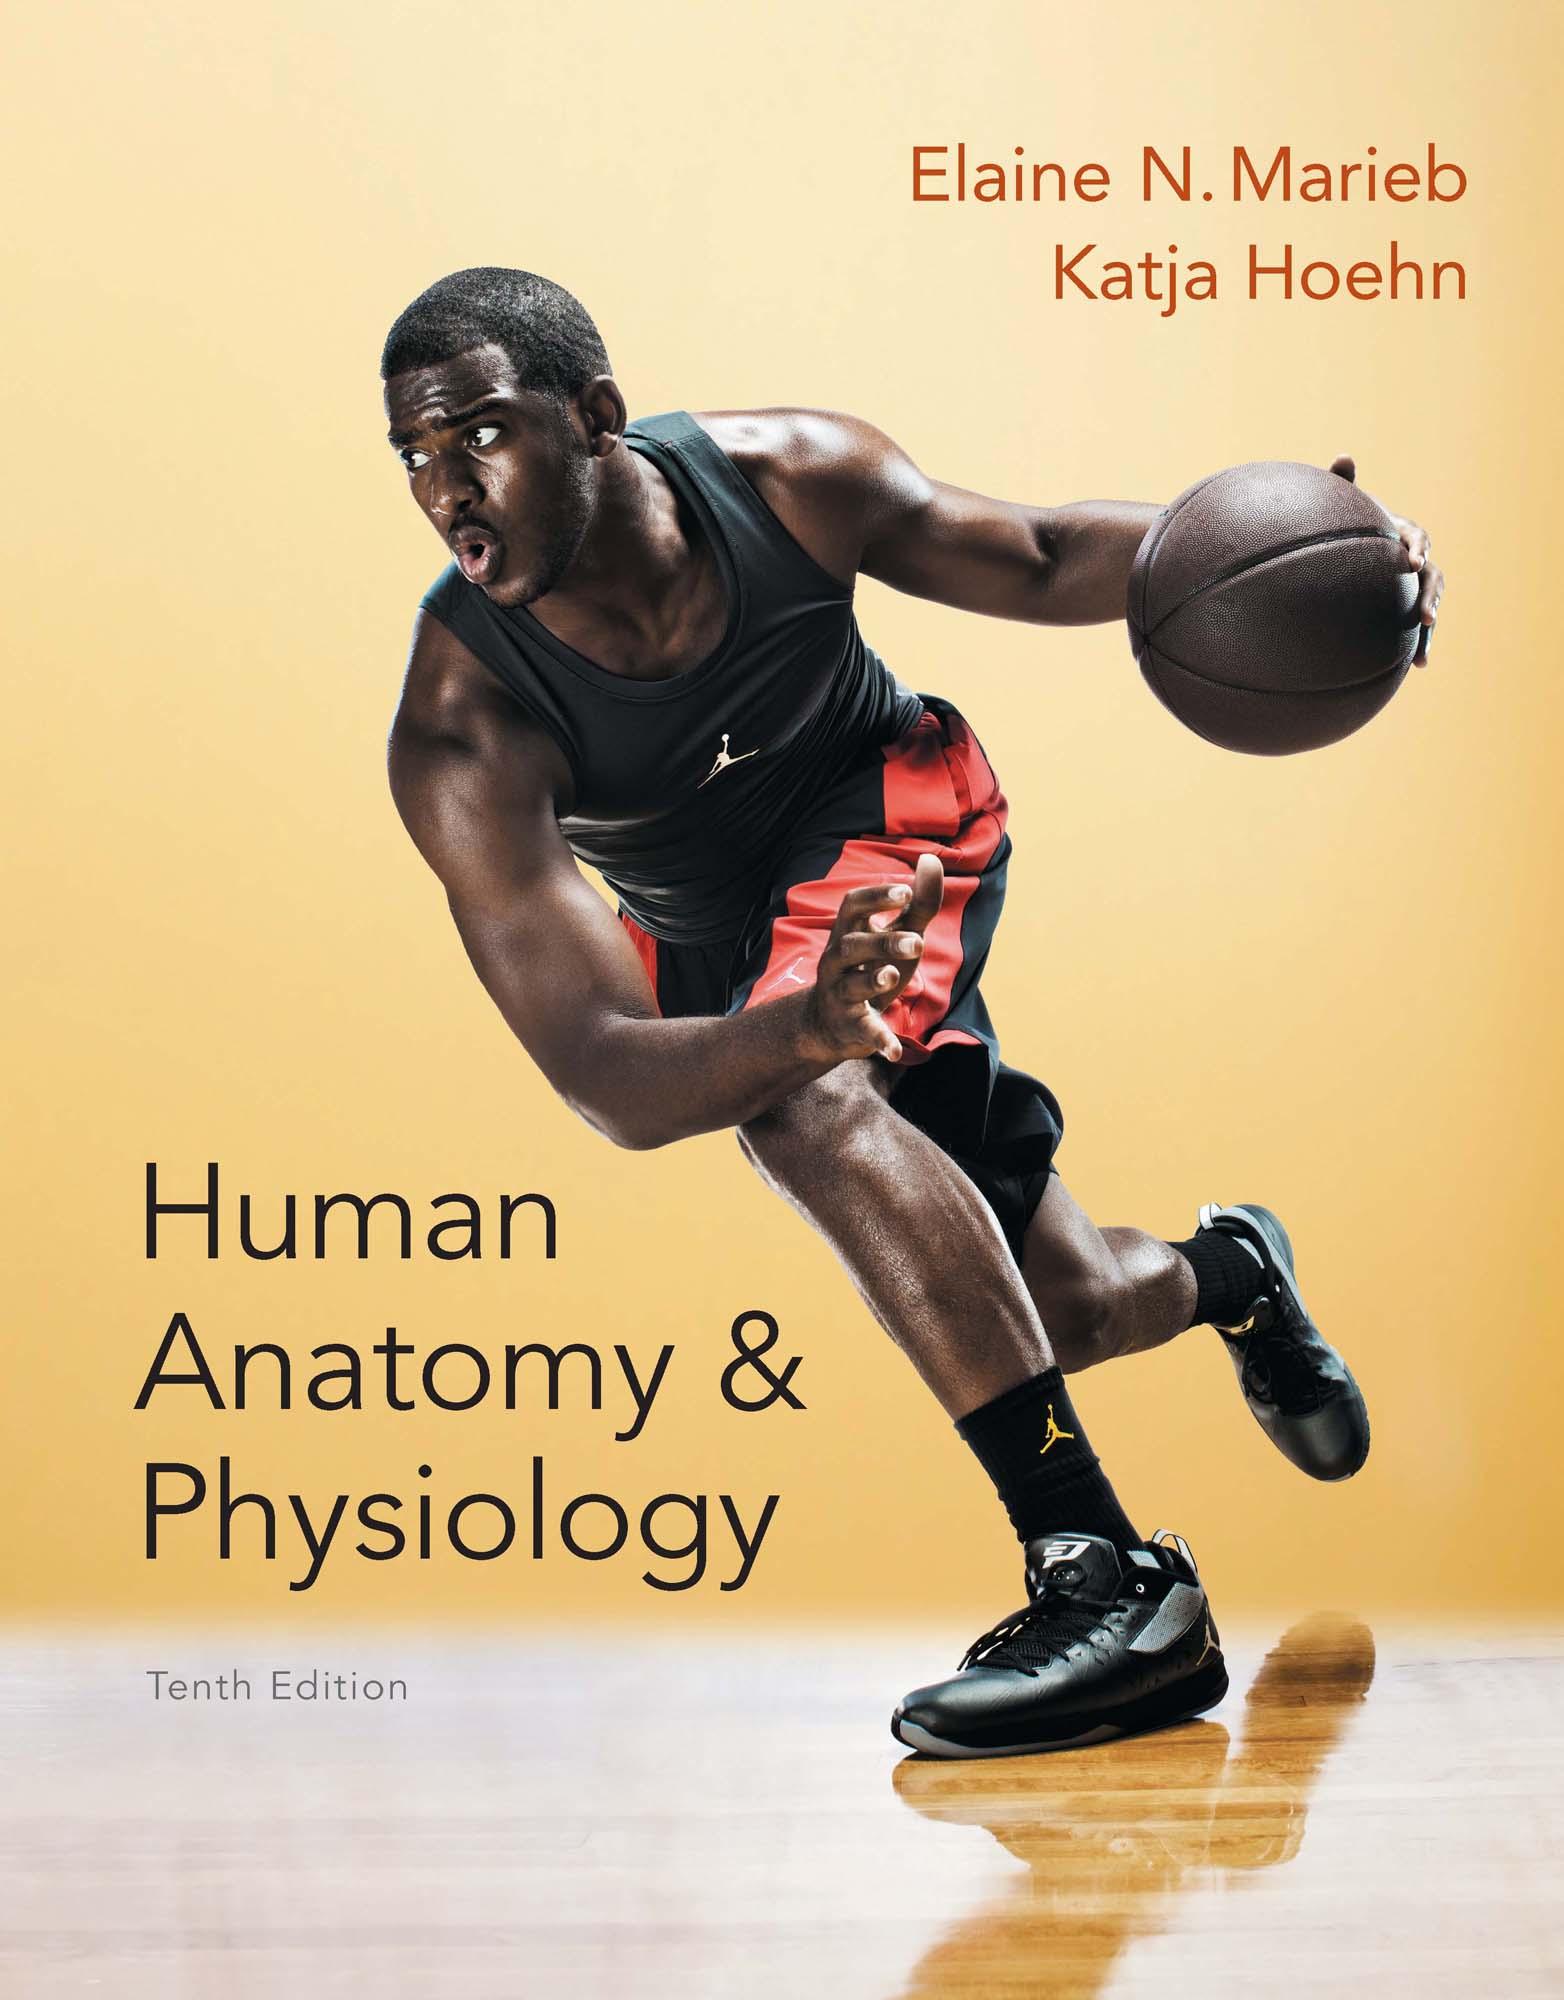 Human Anatomy & Physiology 9780321927040 | 9780134017808 RedShelf